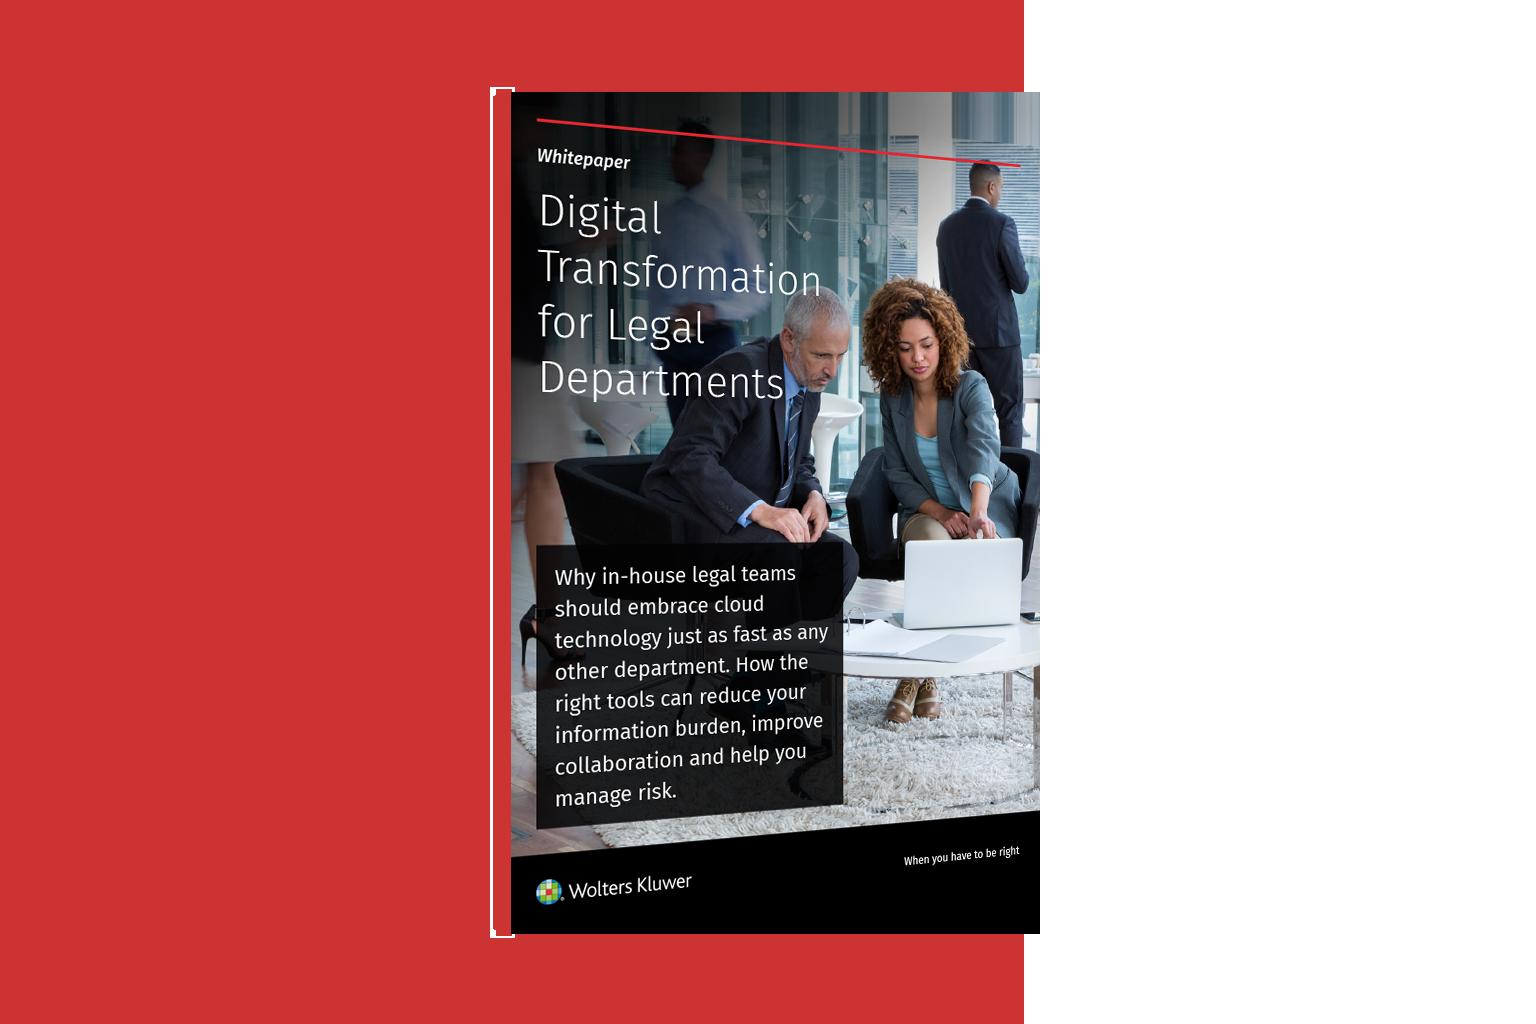 Legisway-digital transformation